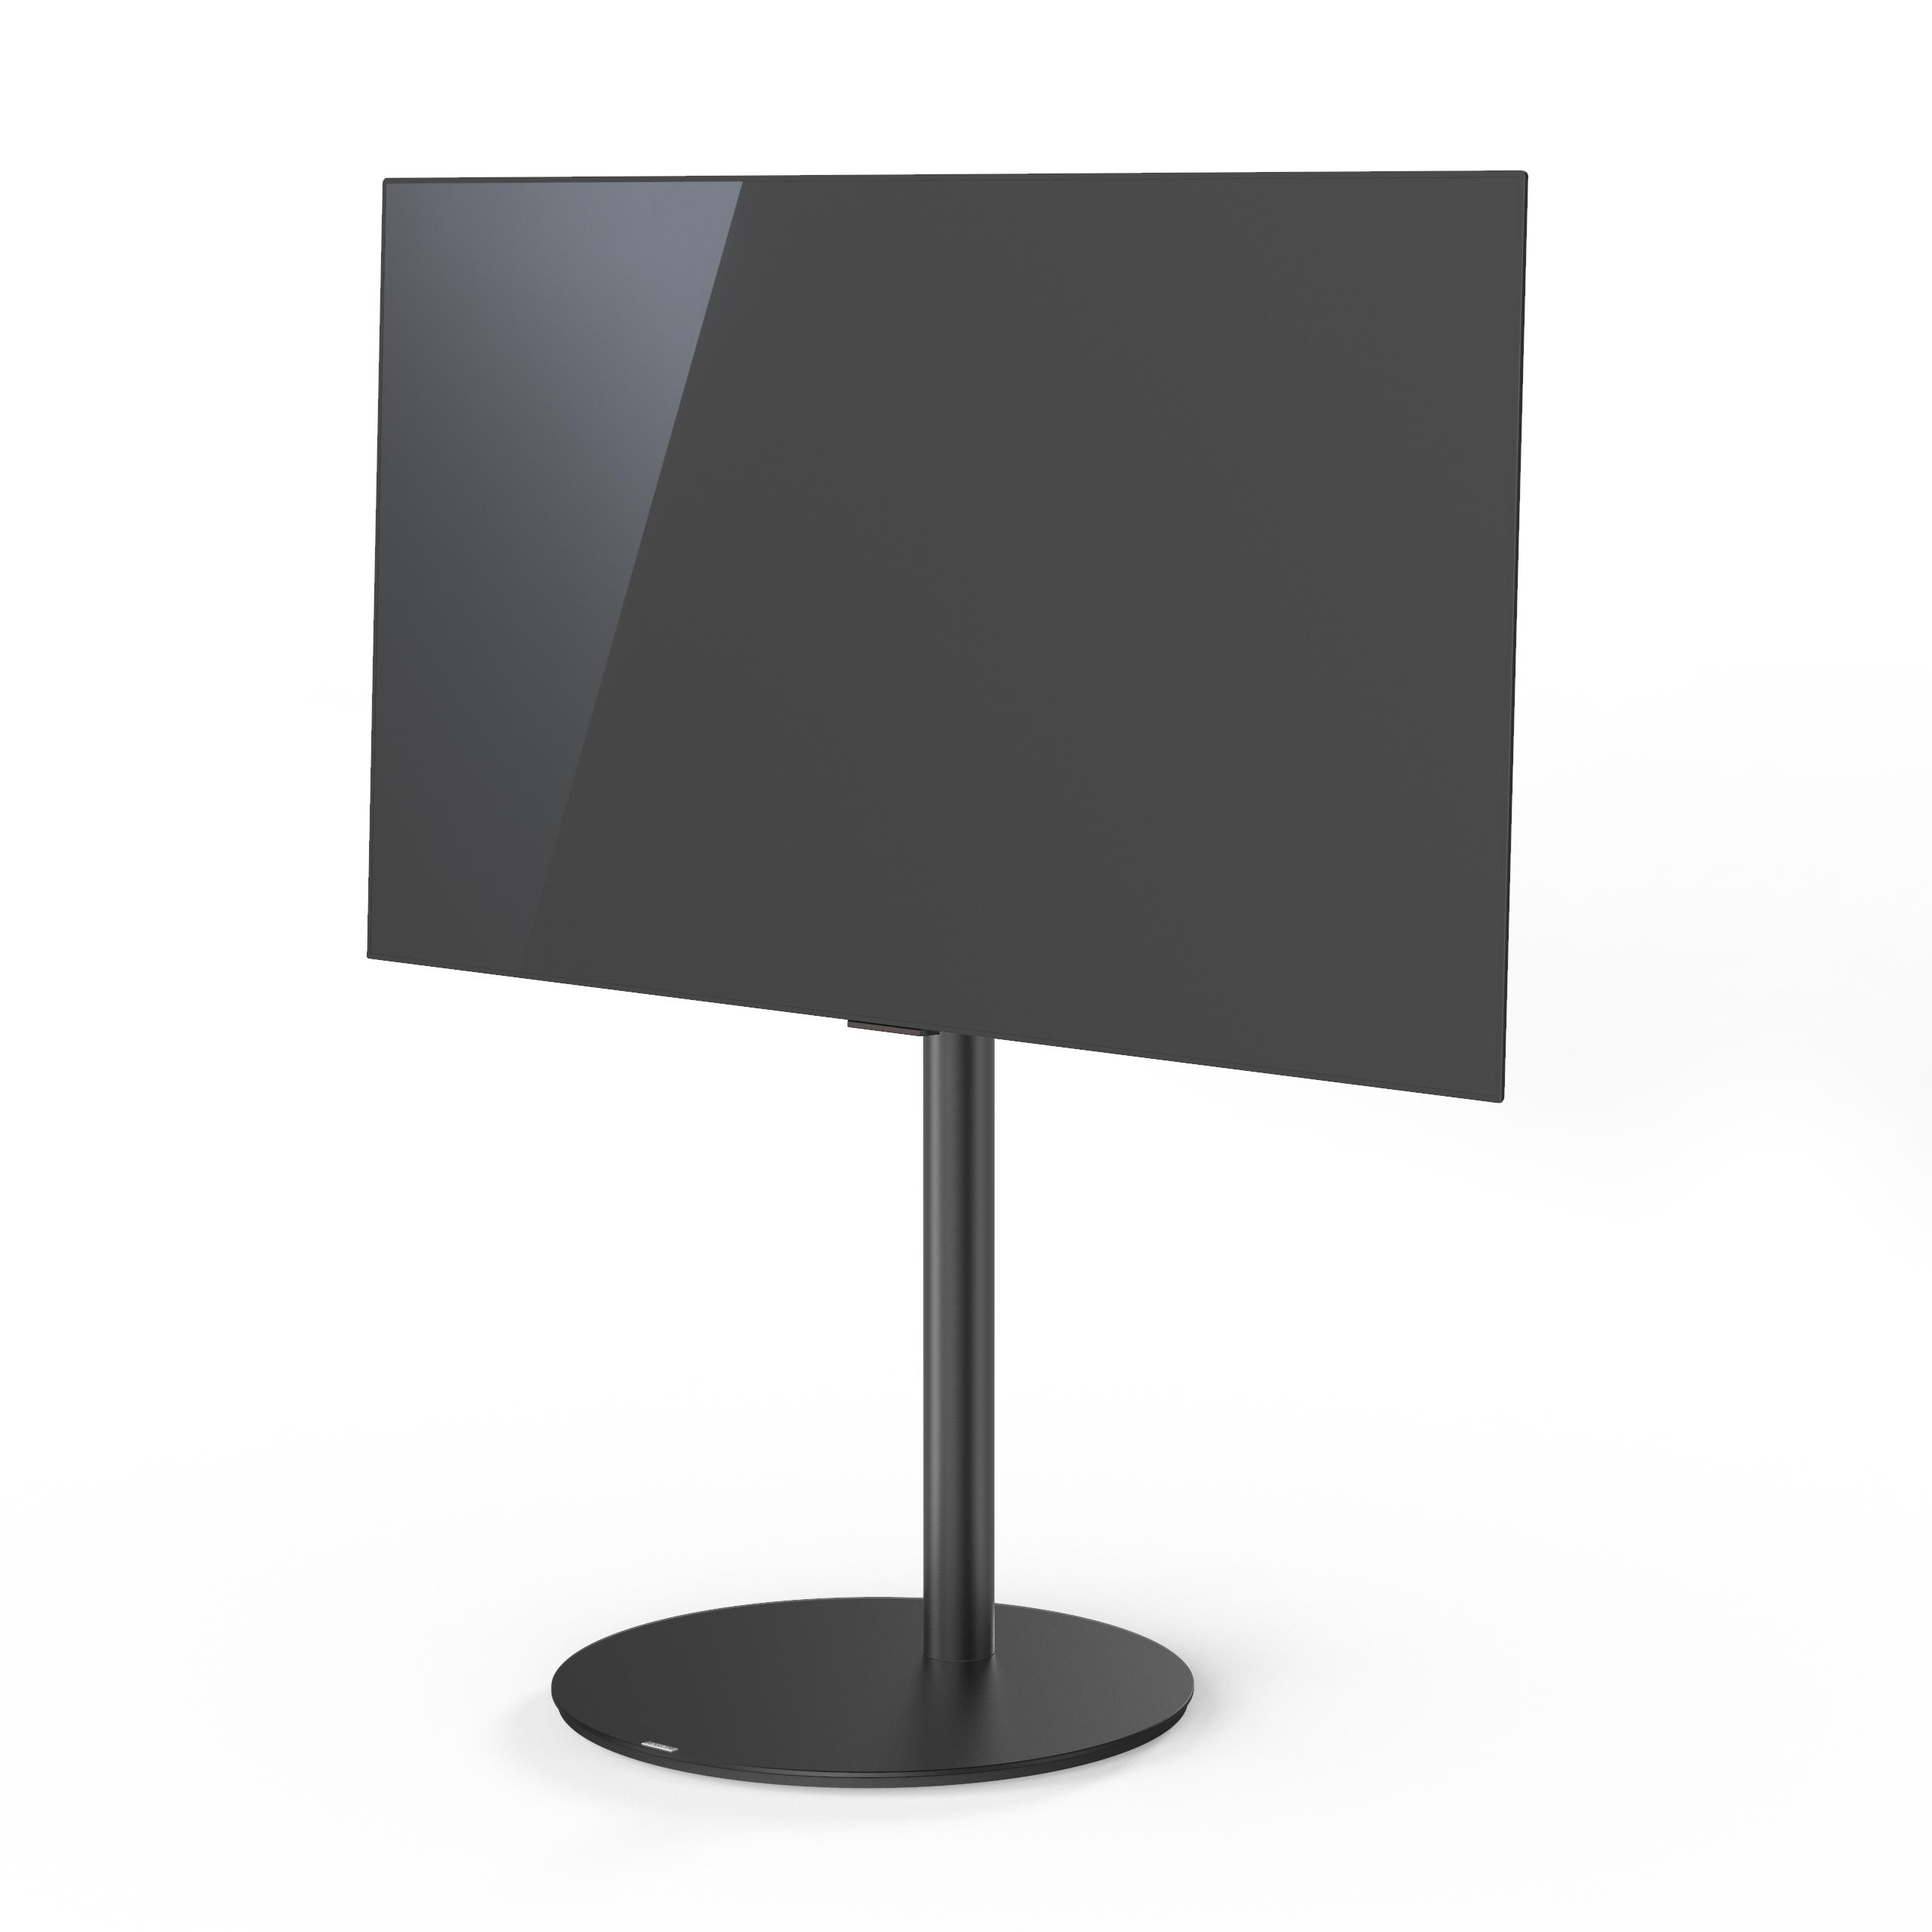 VX1000 draaibare tv-standaard, zwart glas, zwarte buis